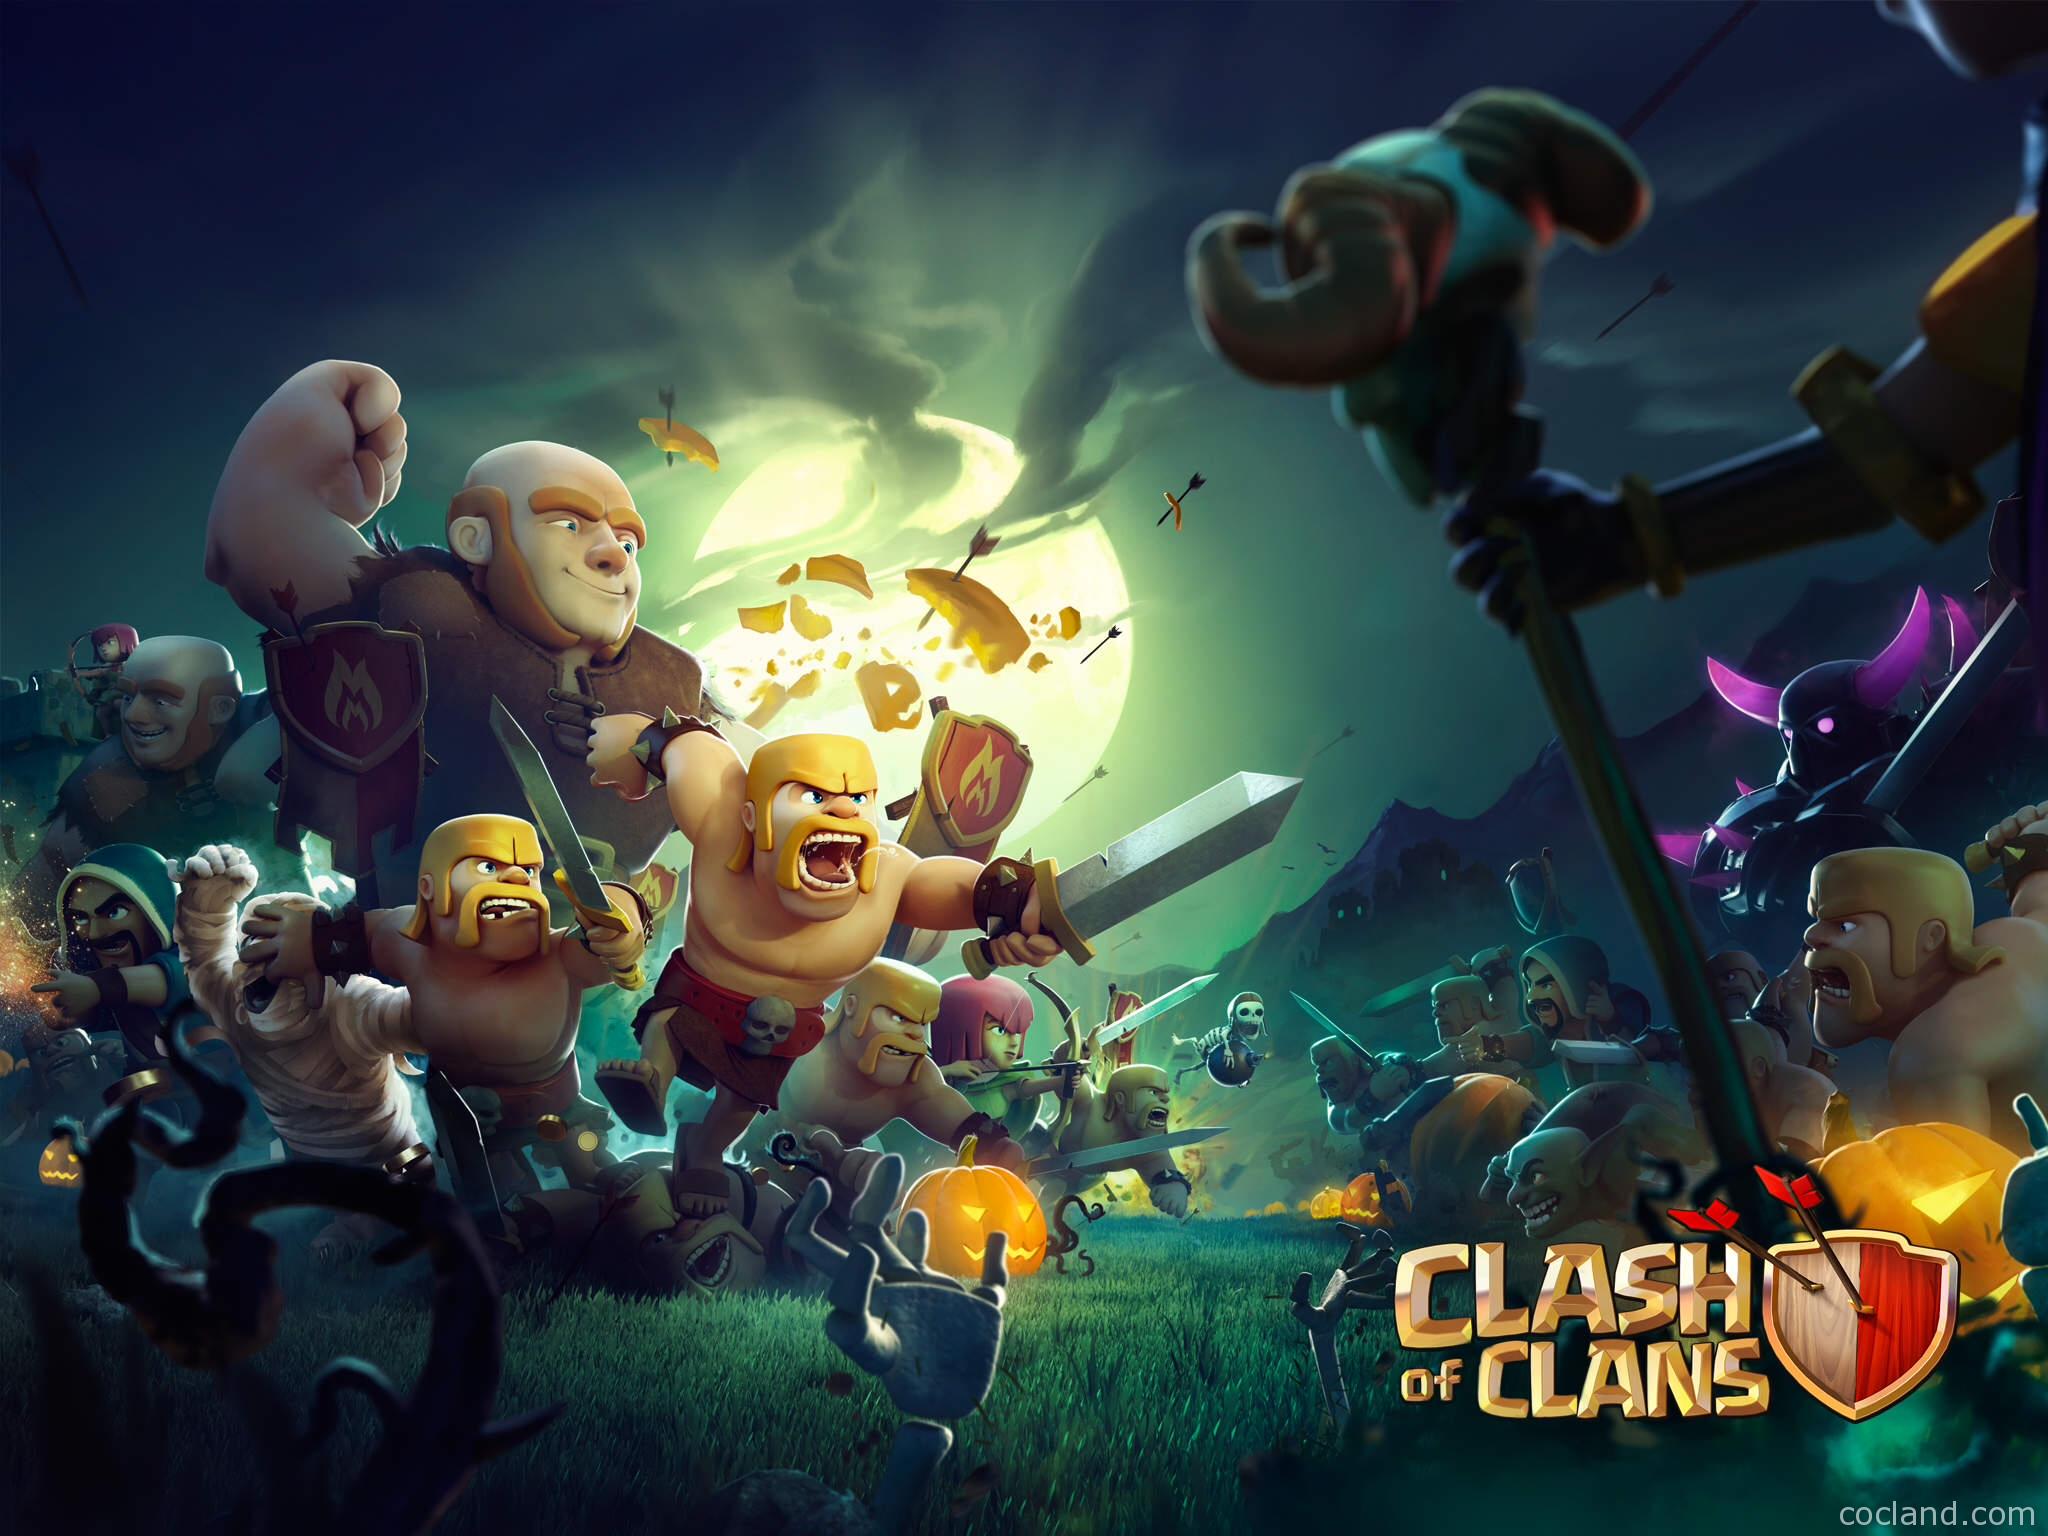 Clash of Clans Wallpaper HD